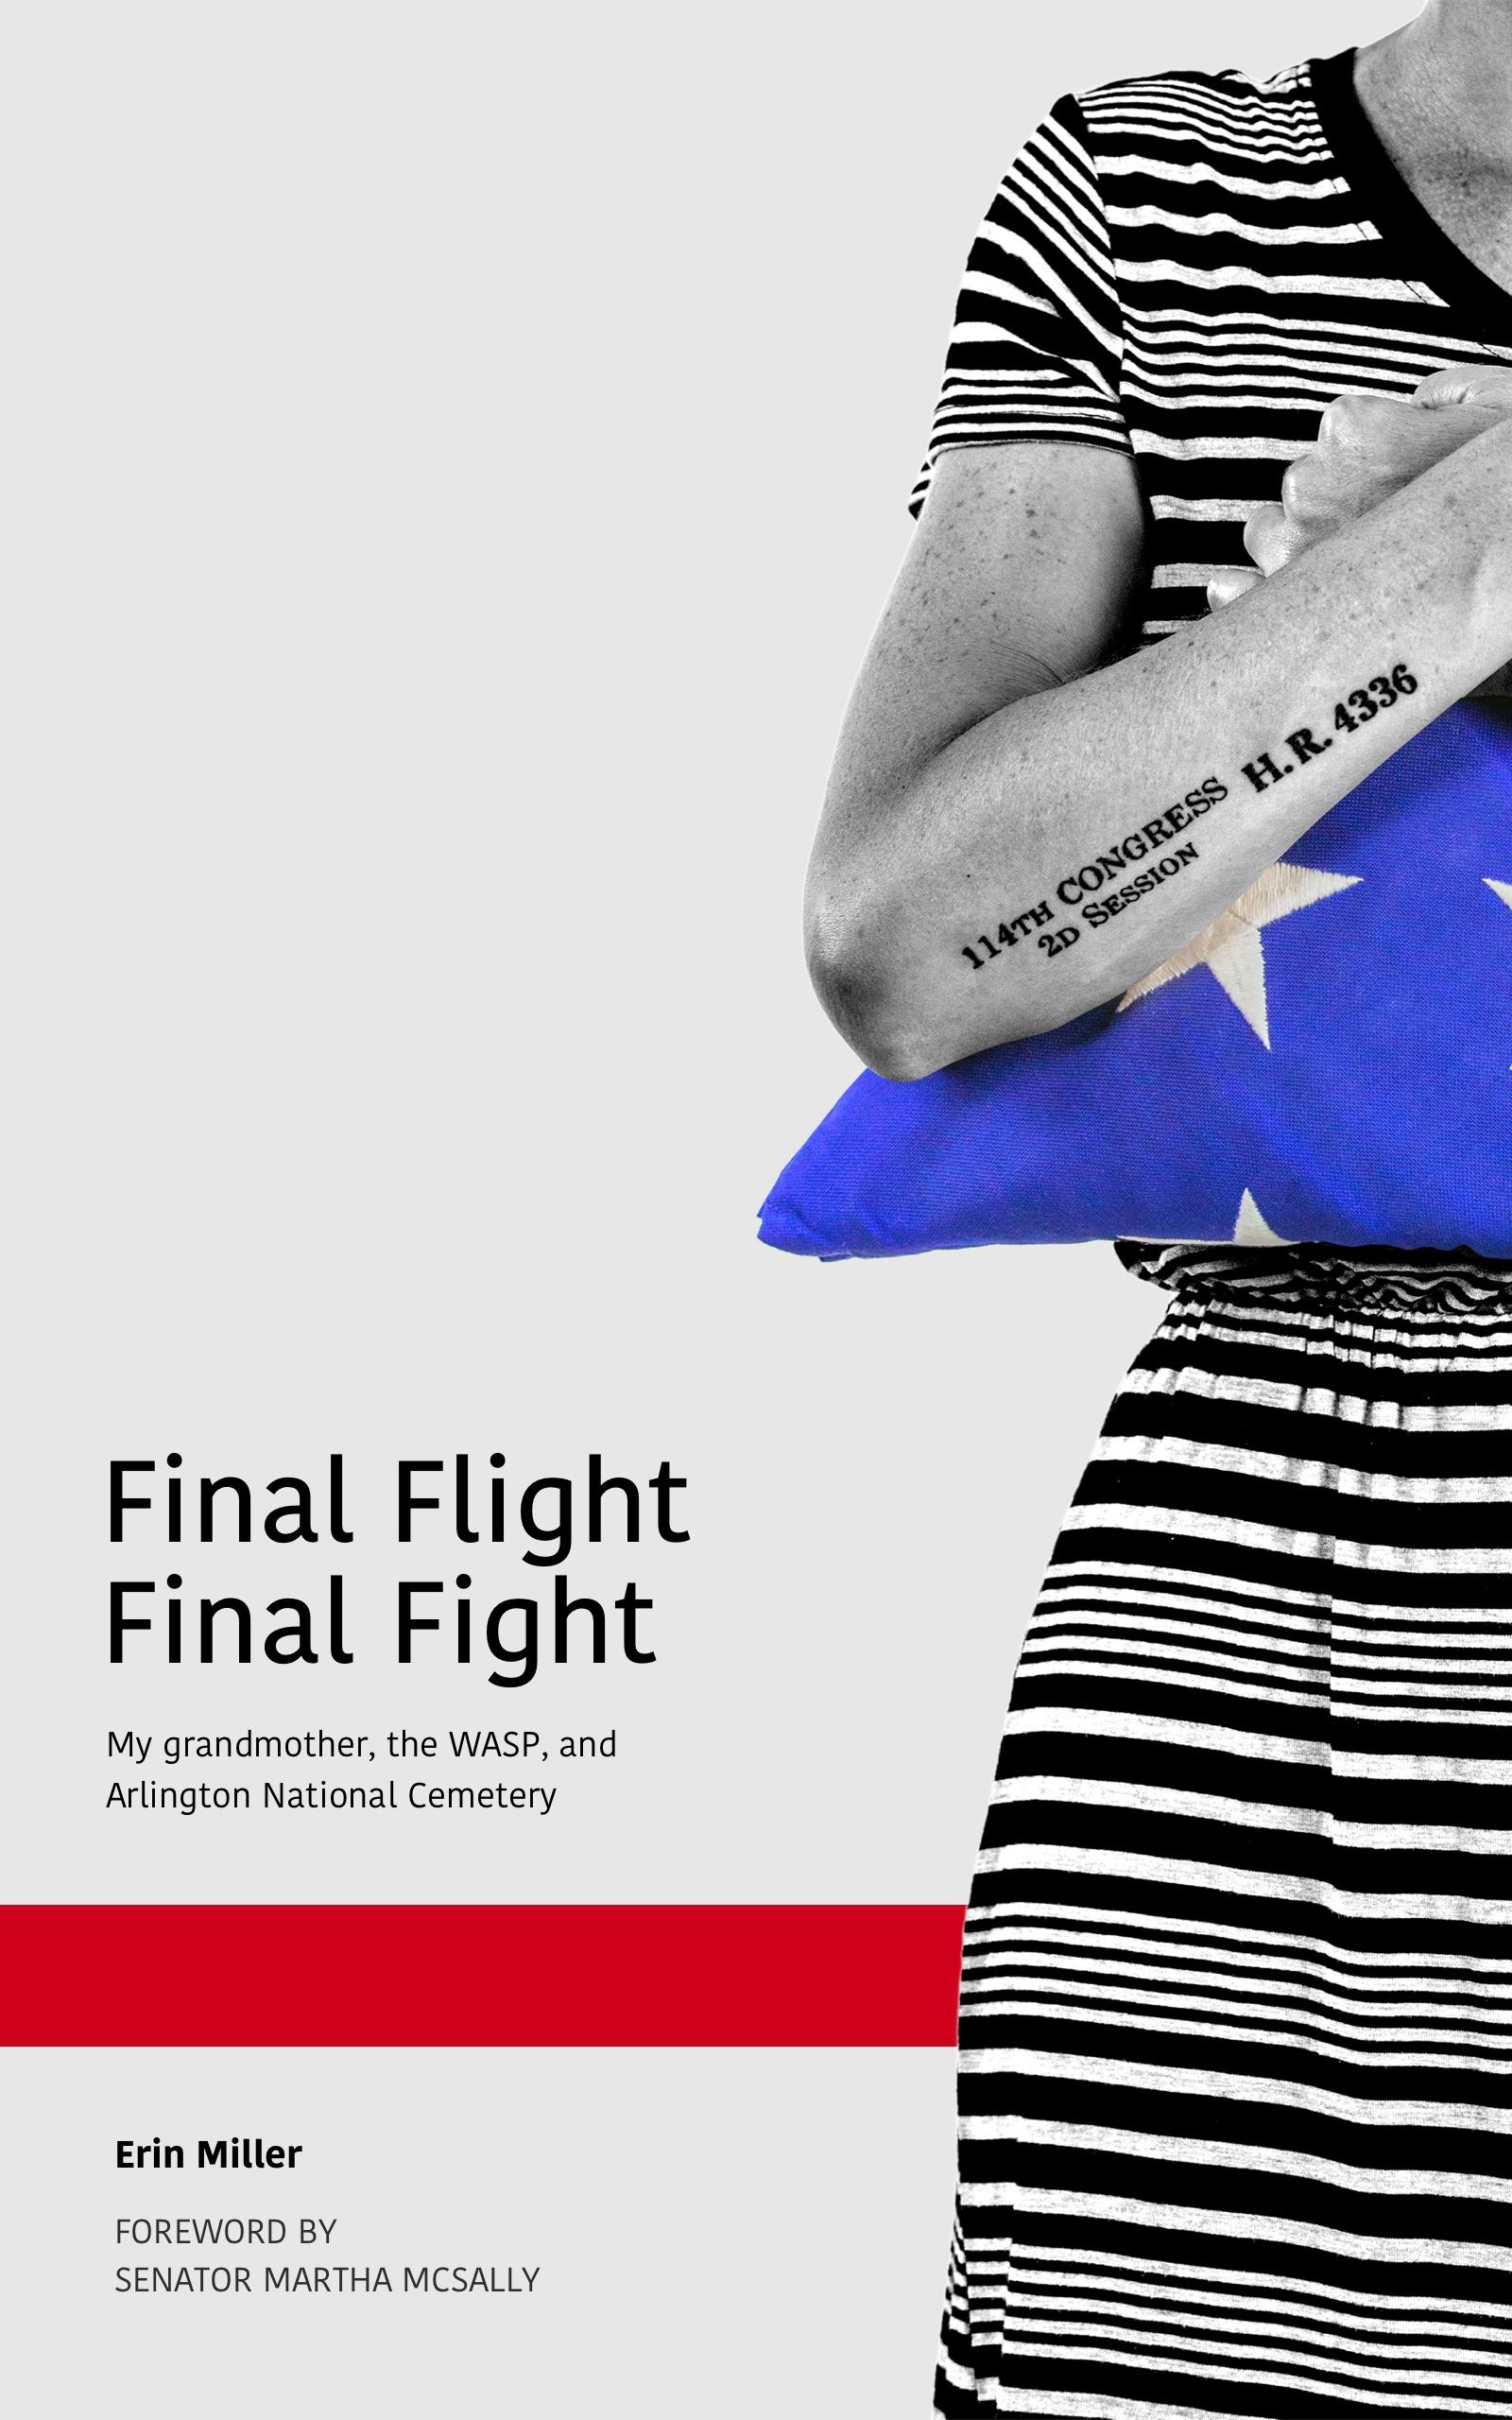 final e book cover.jpg